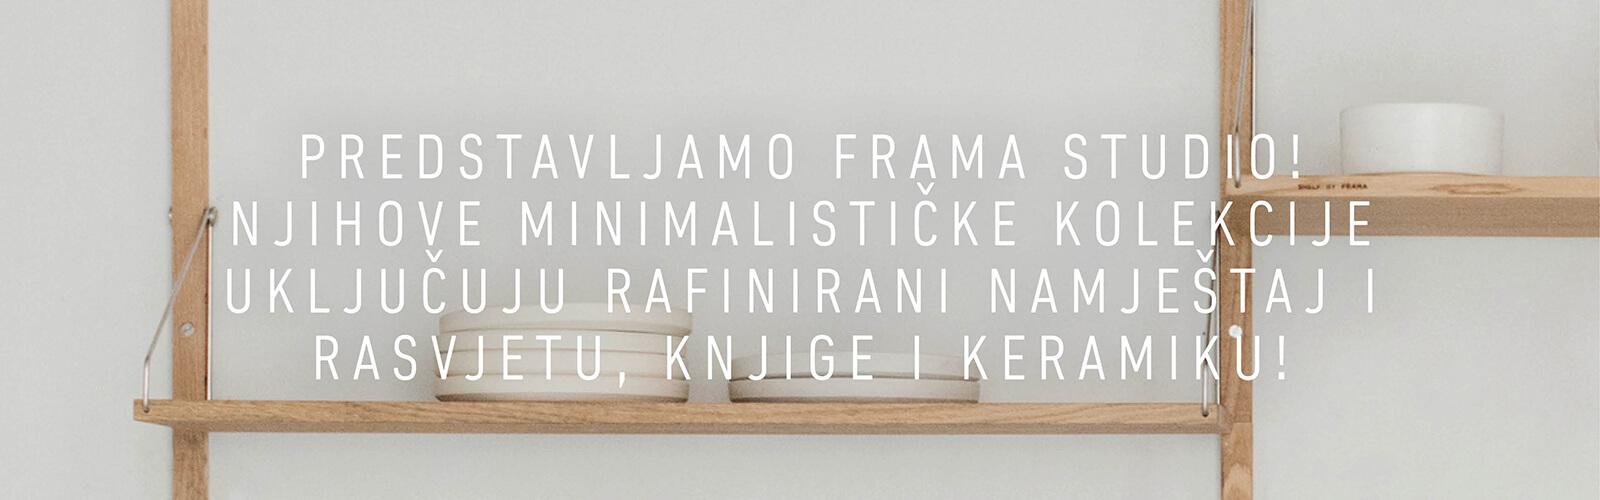 banner_1600x500_09_2019_frama_hr_2